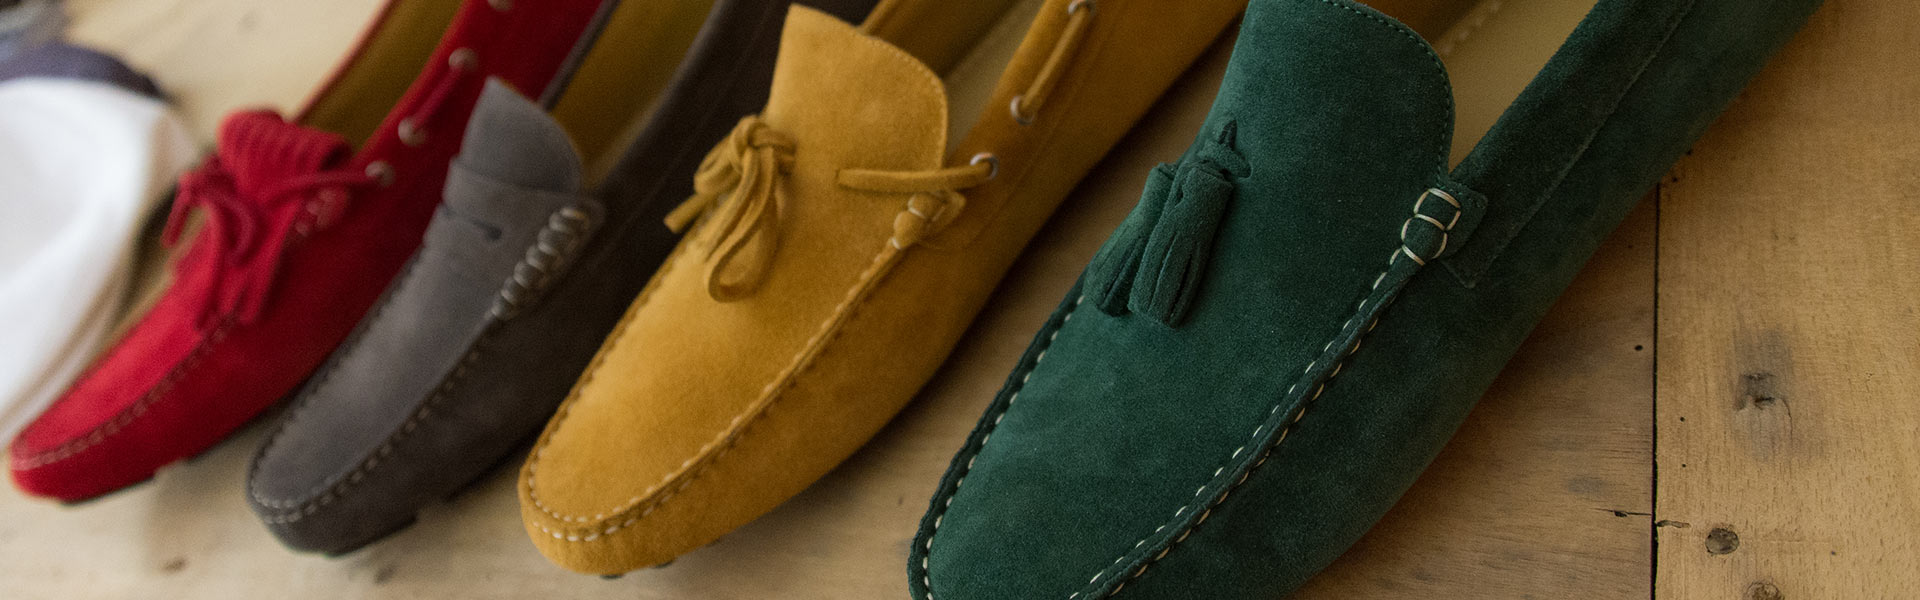 Biorn Shoes - home page - slider